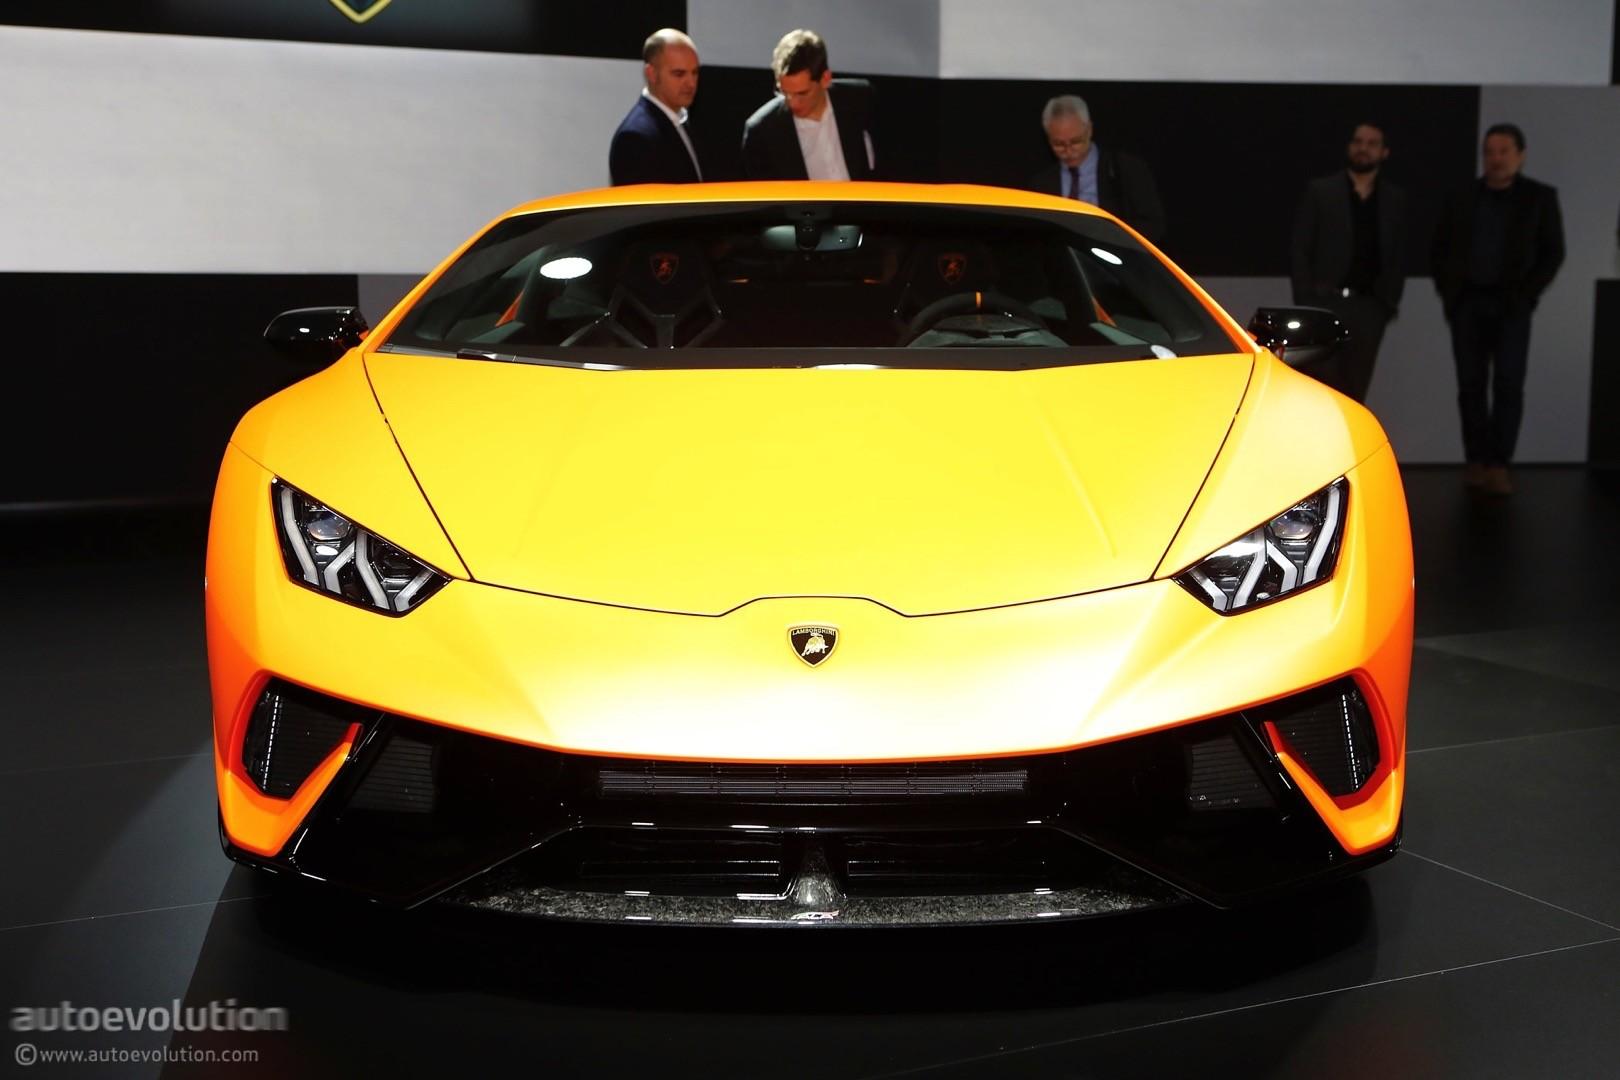 Lamborghini Huracan Performante Live At 2017 Geneva Motor Show ...